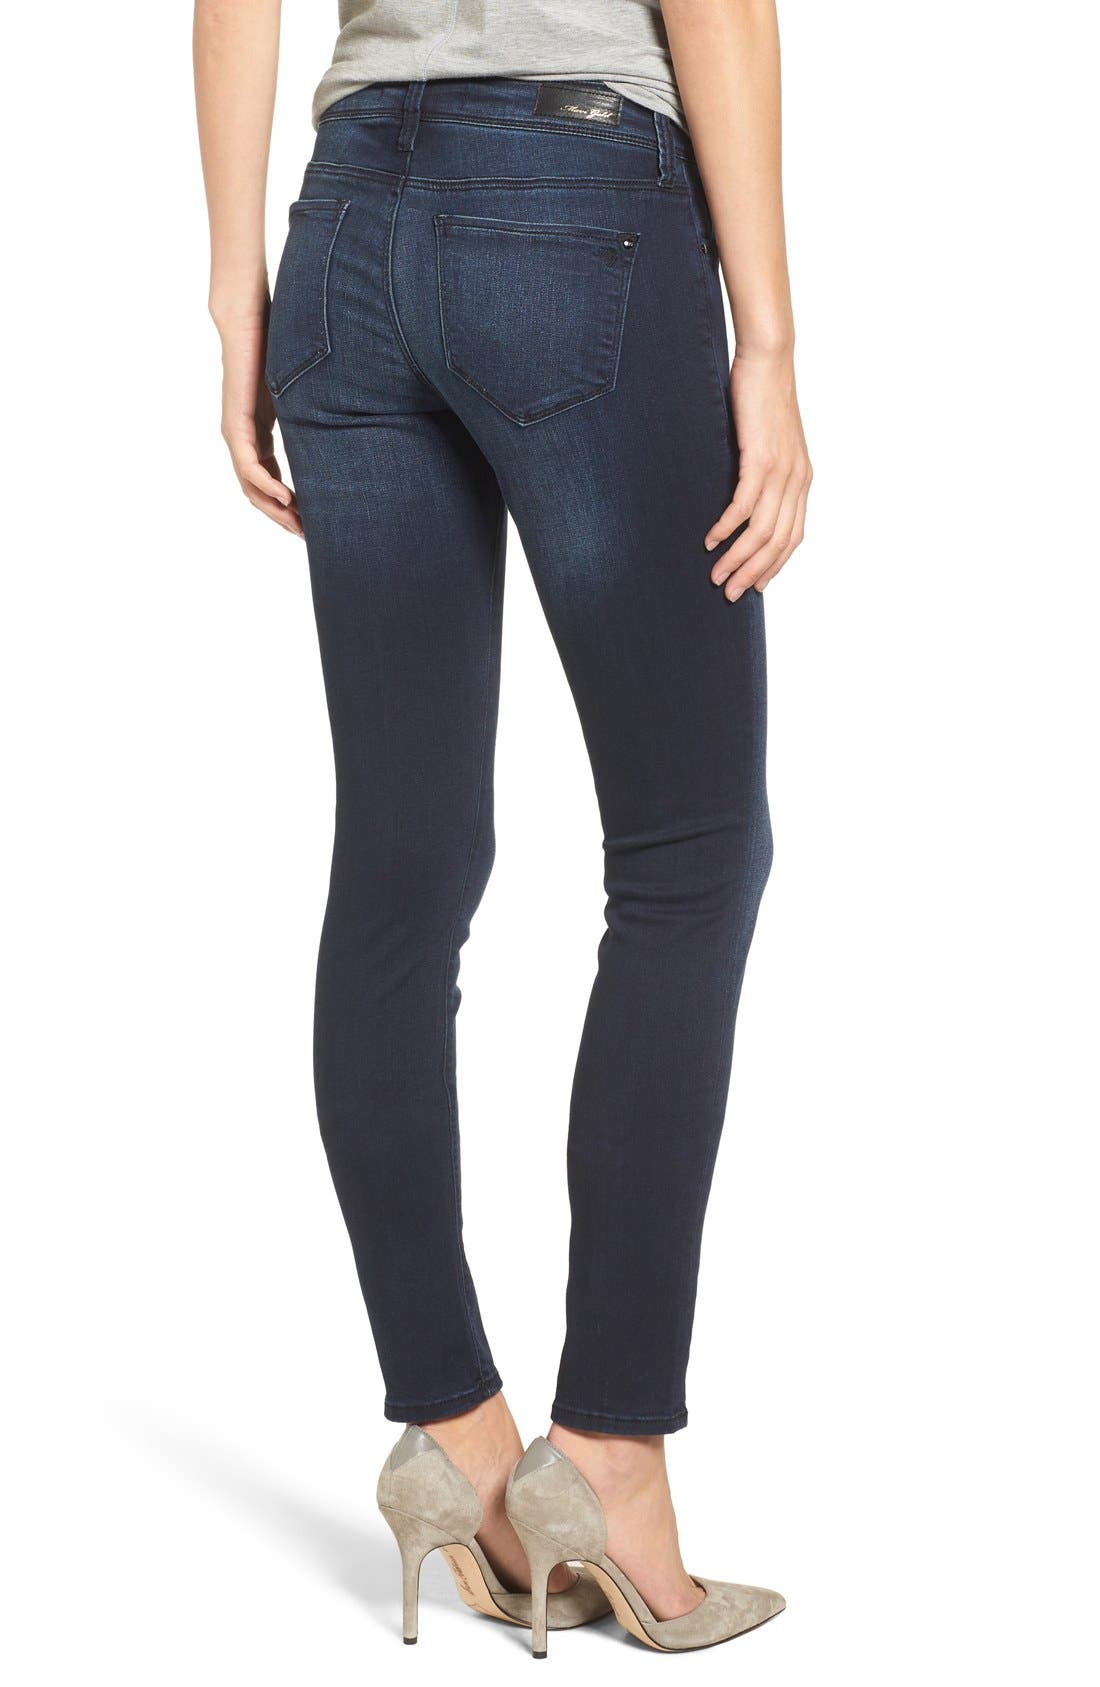 Alternate Image 2  - Mavi Jeans Gold Alexa Stretch Skinny Jeans (Deep Feather) (Regular & Petite)